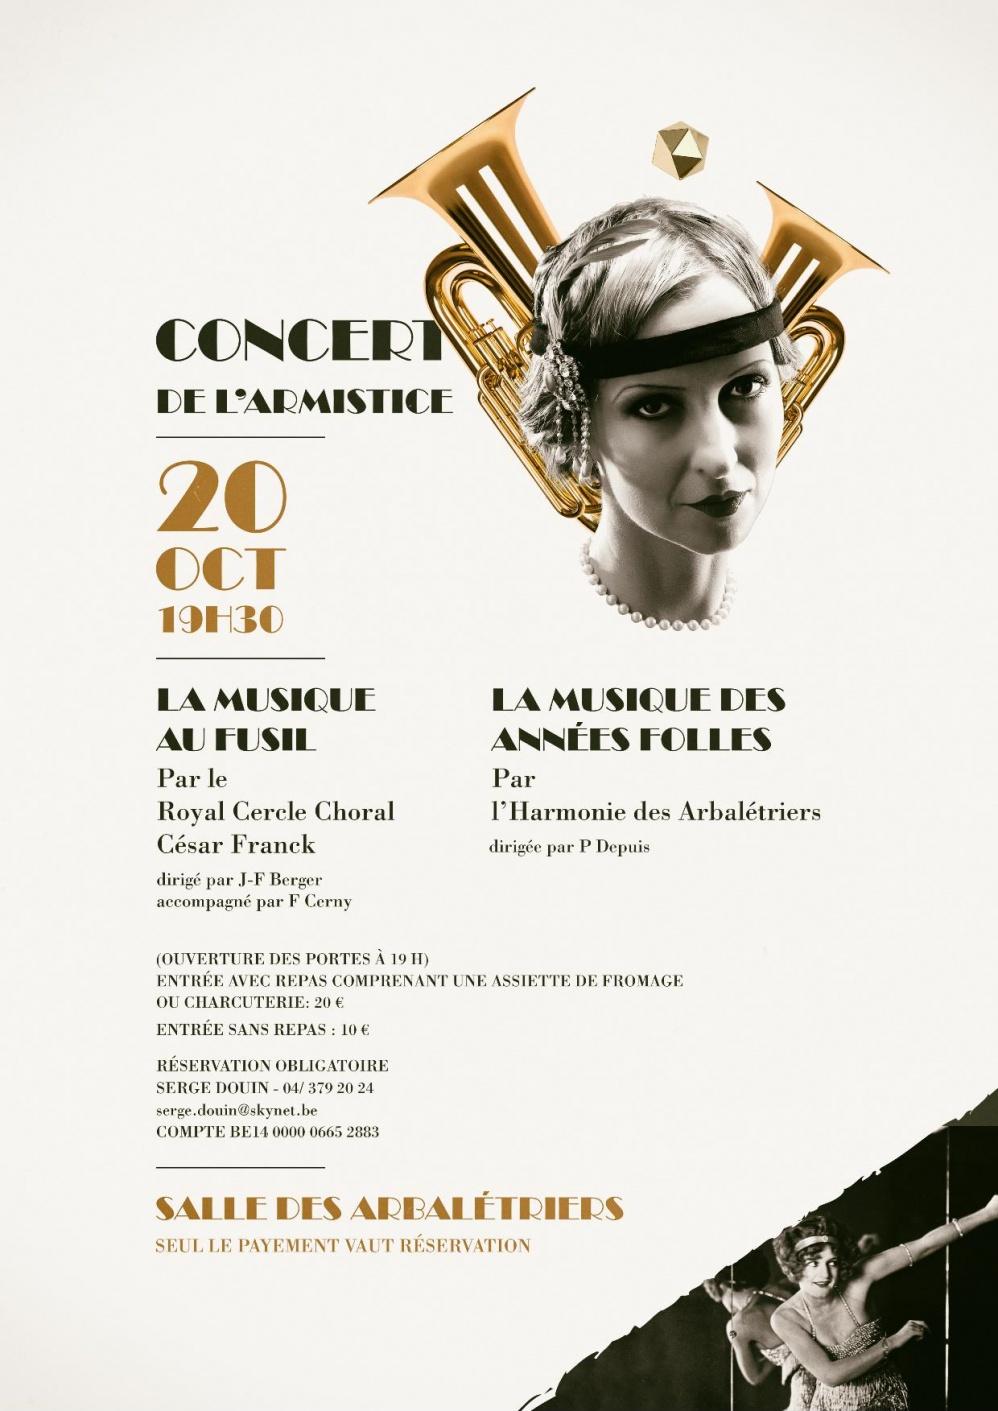 Concert de l'Armistice 🗓 🗺